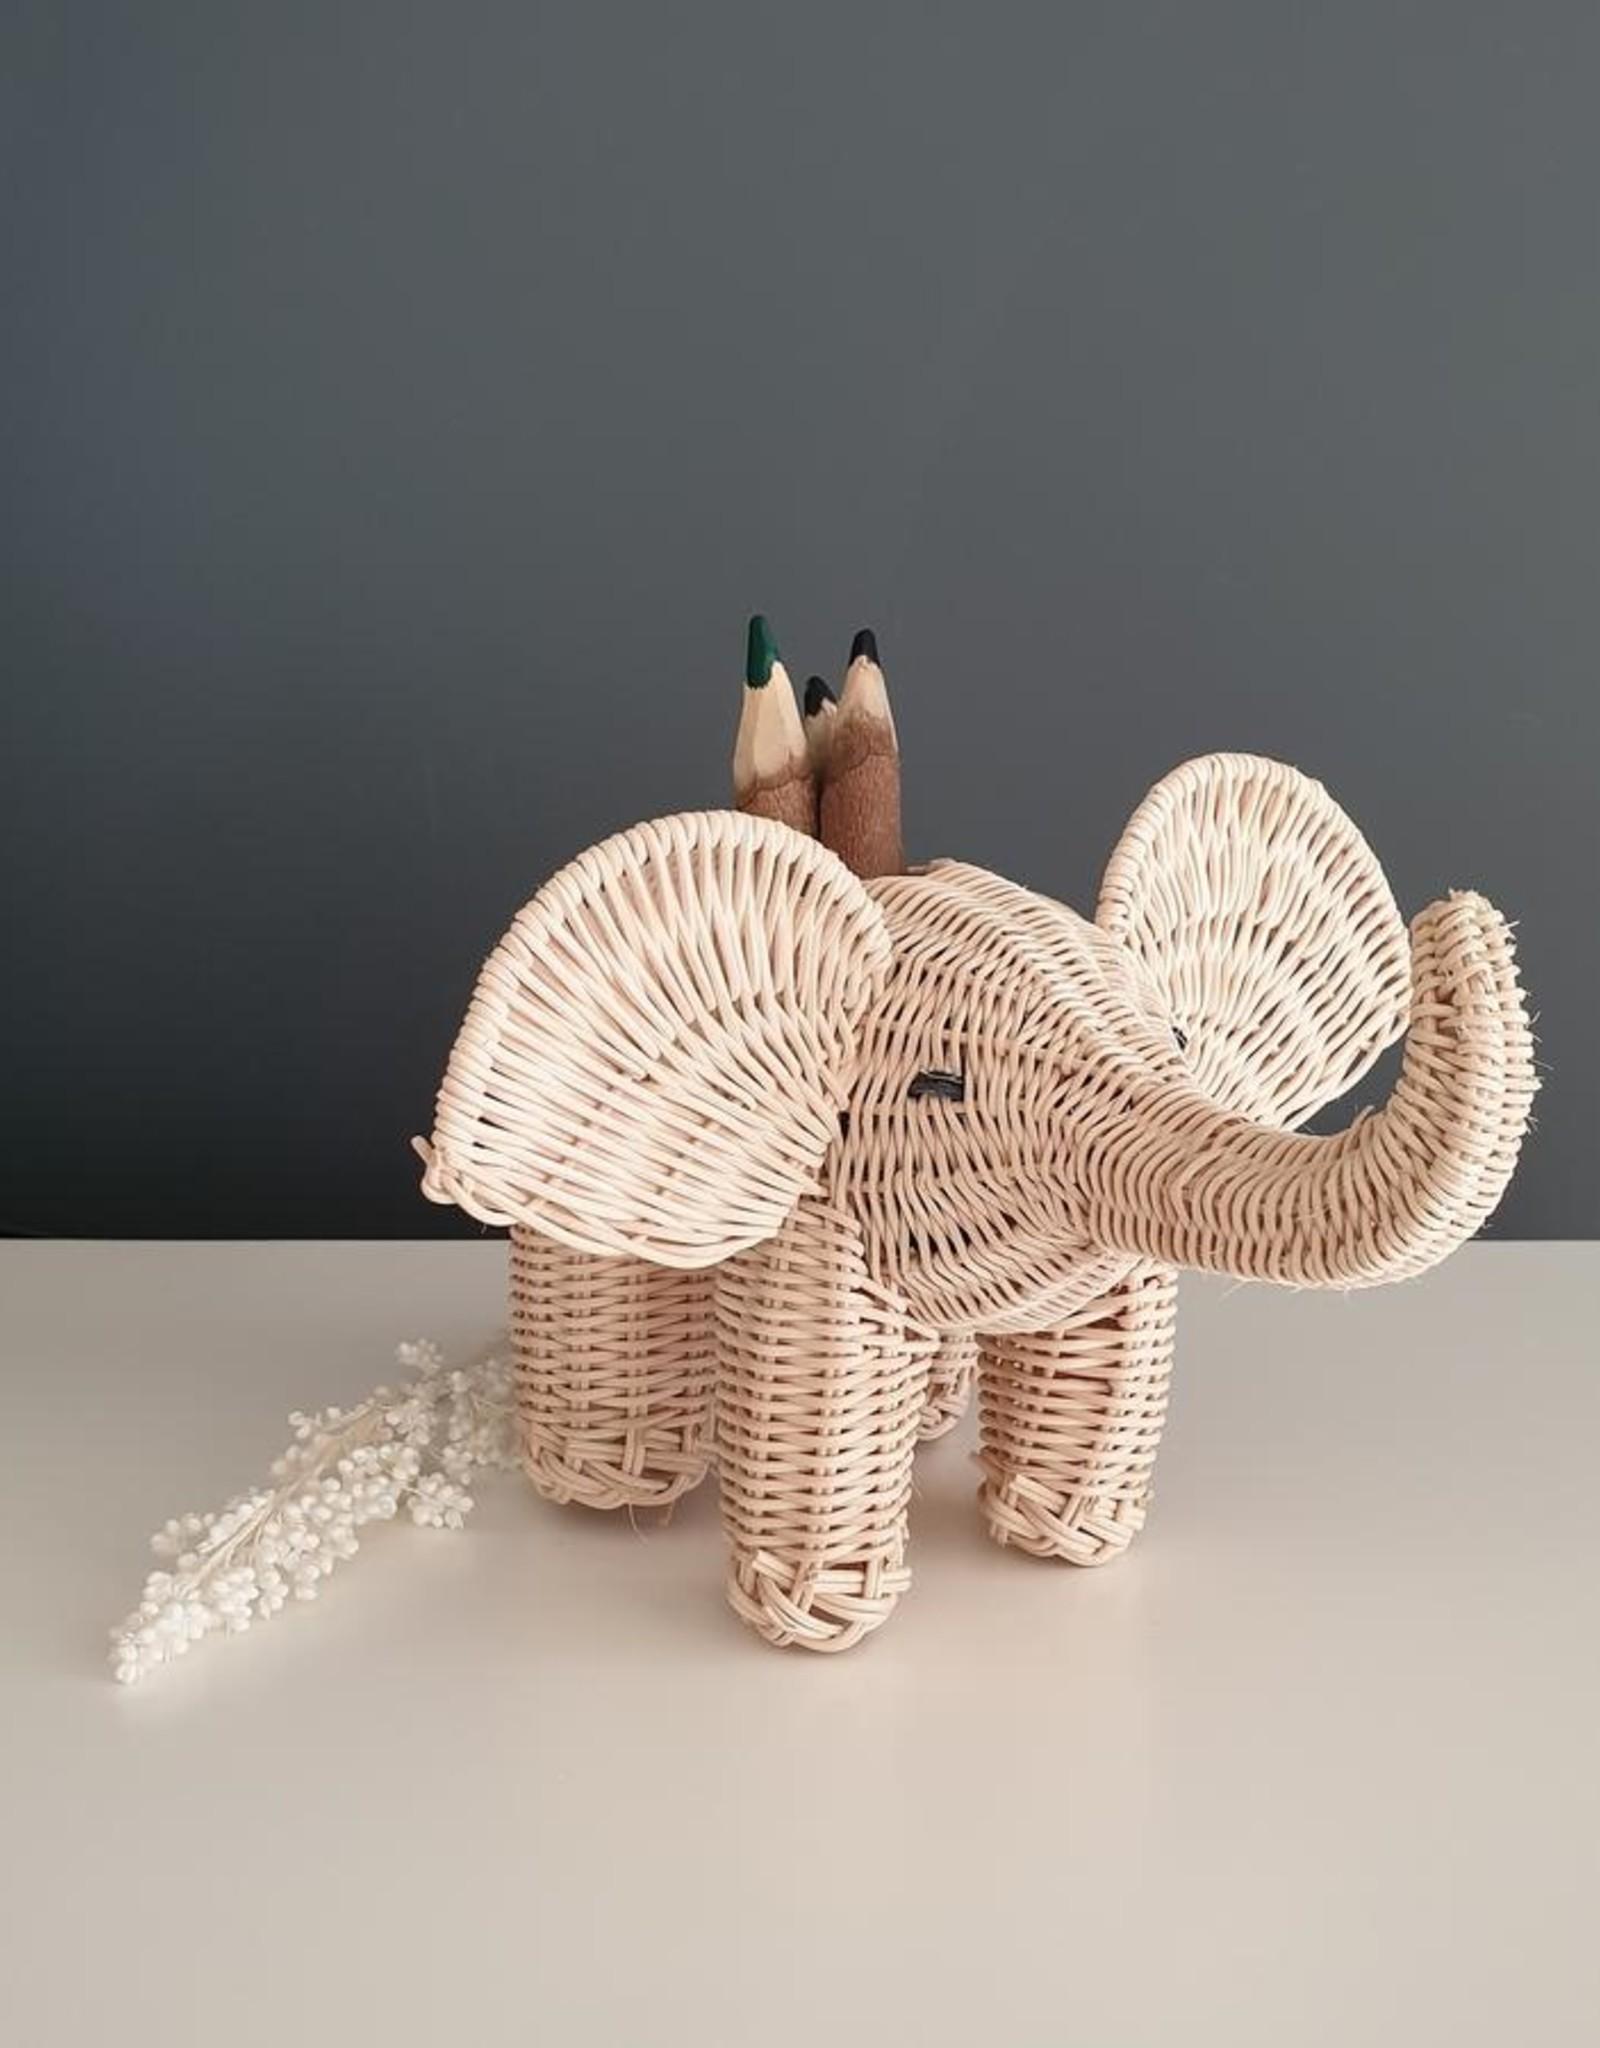 Coconeh Pencil Holder Elephant Nestor